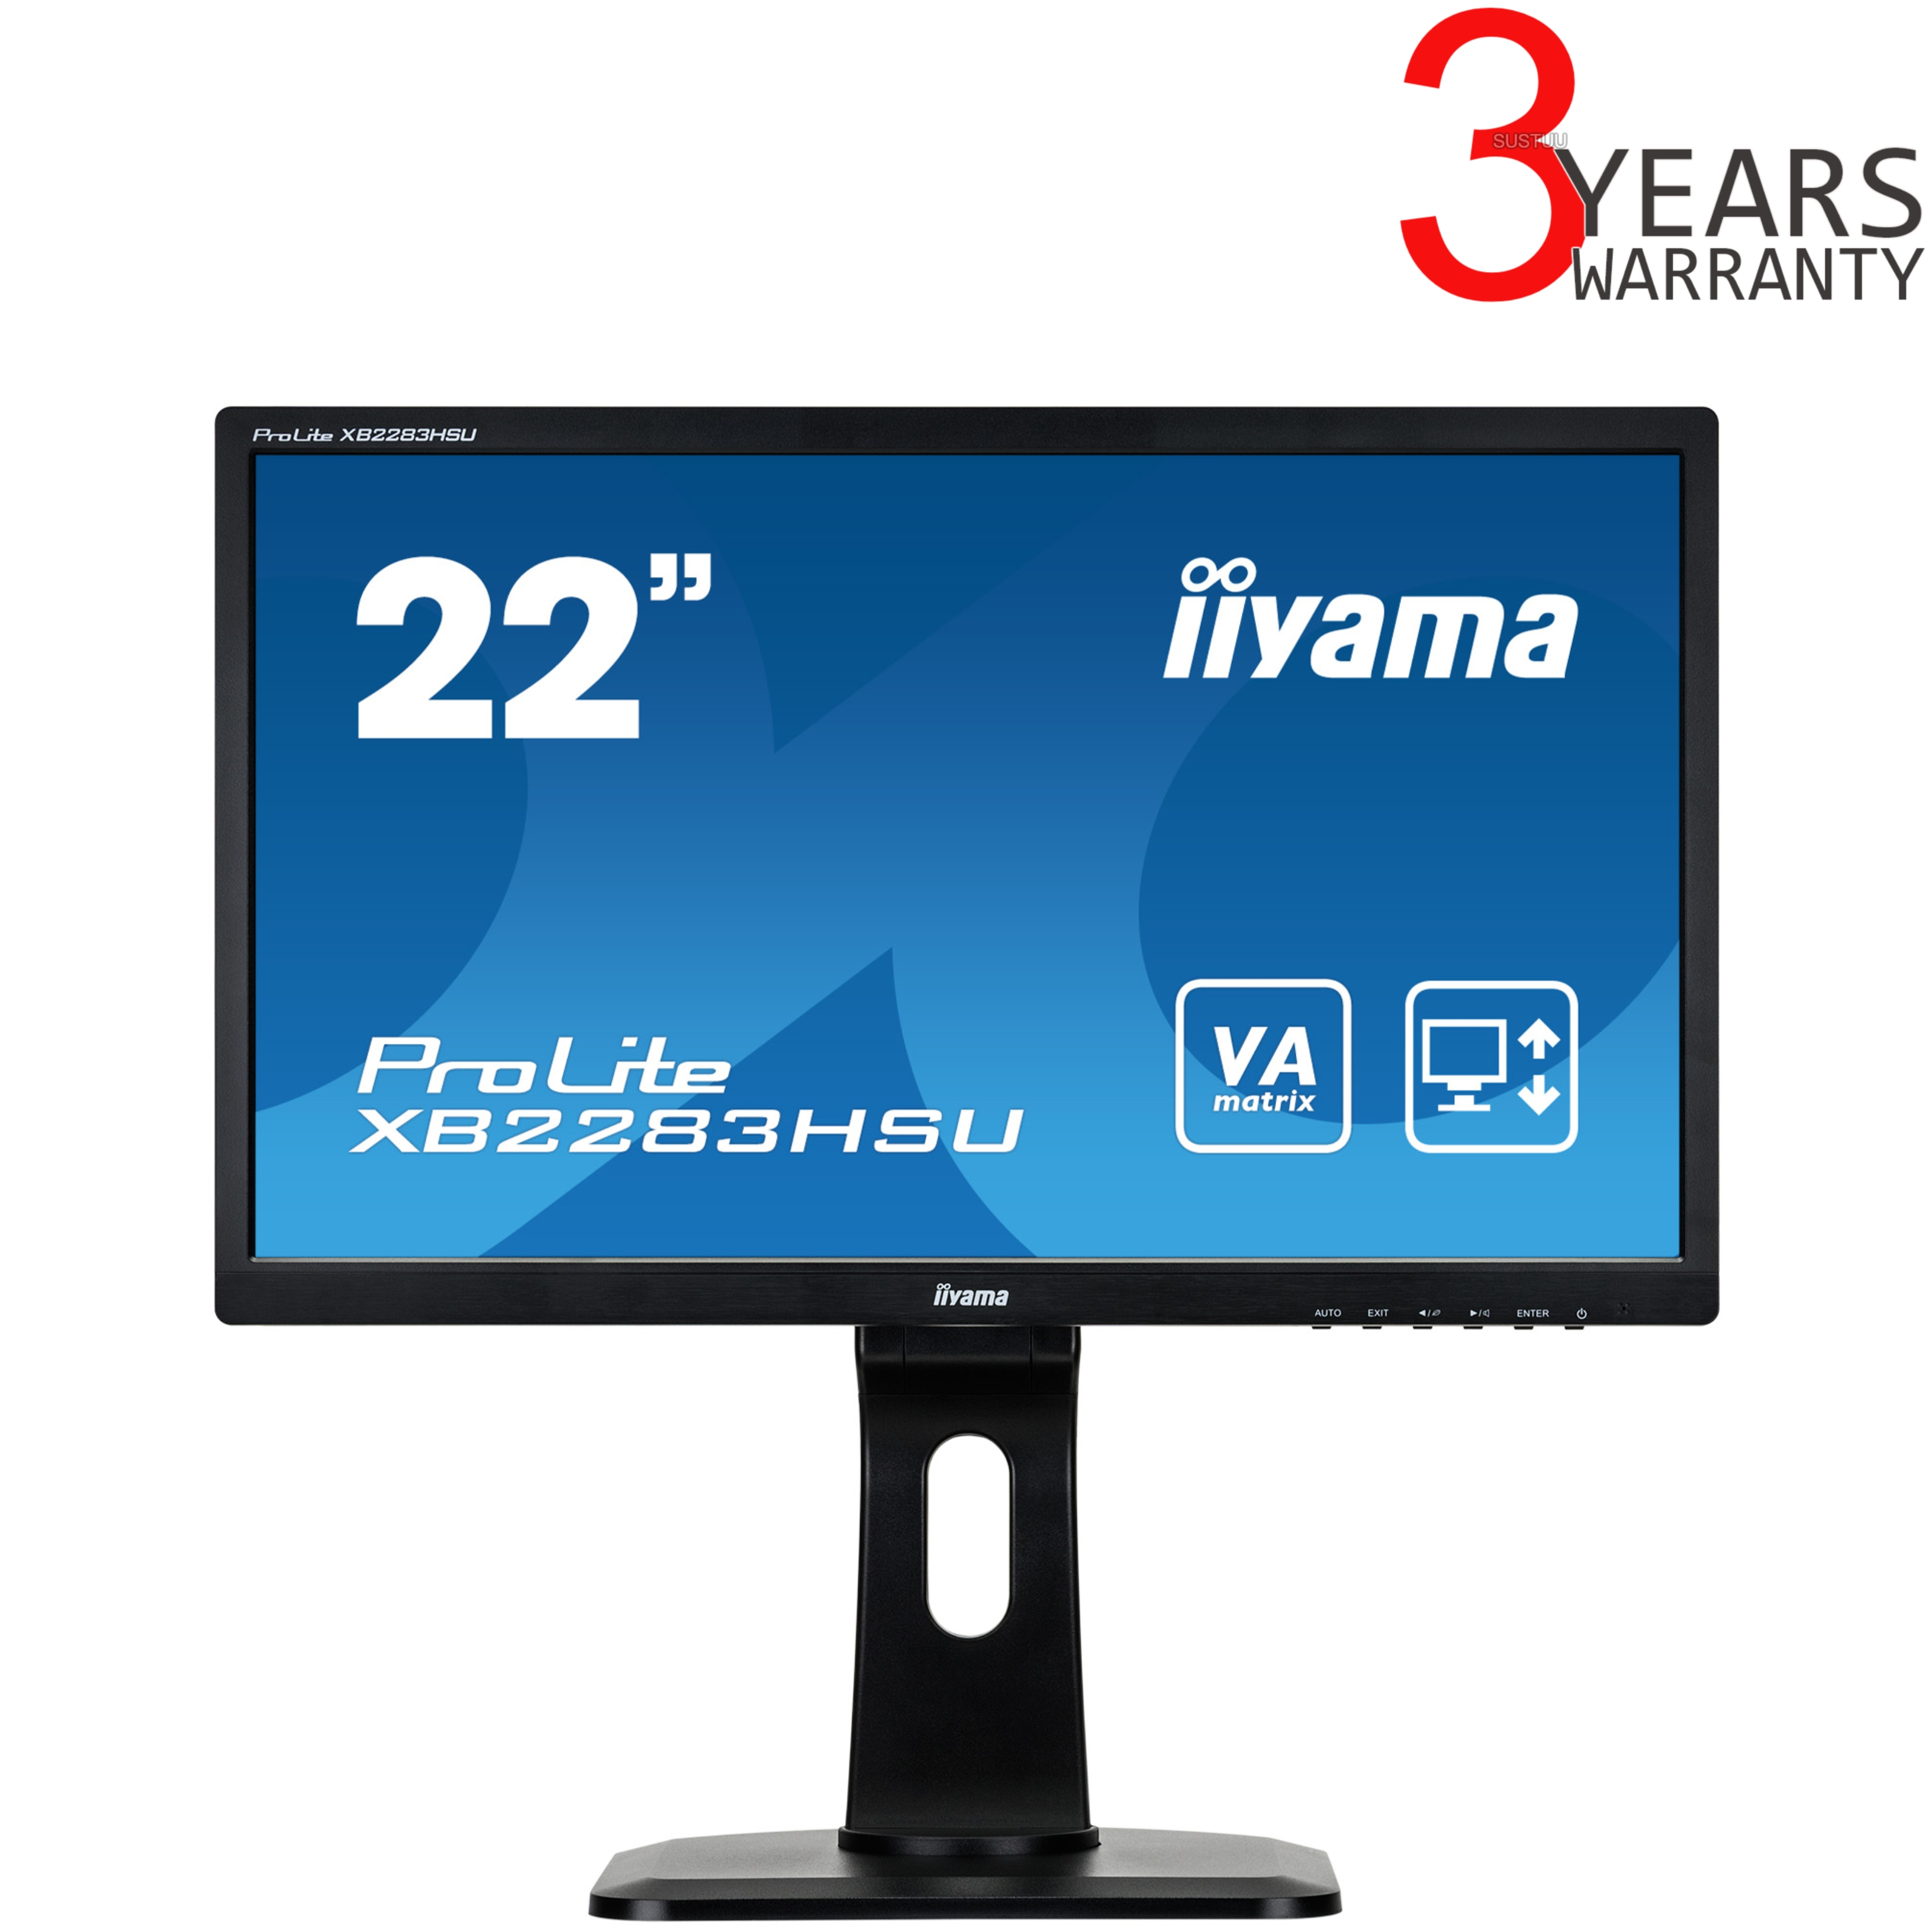 "iiyama XB2283HSU-B1DP 22"" ProLite VA HD H/A LED Computer Monitor Screen - Black"